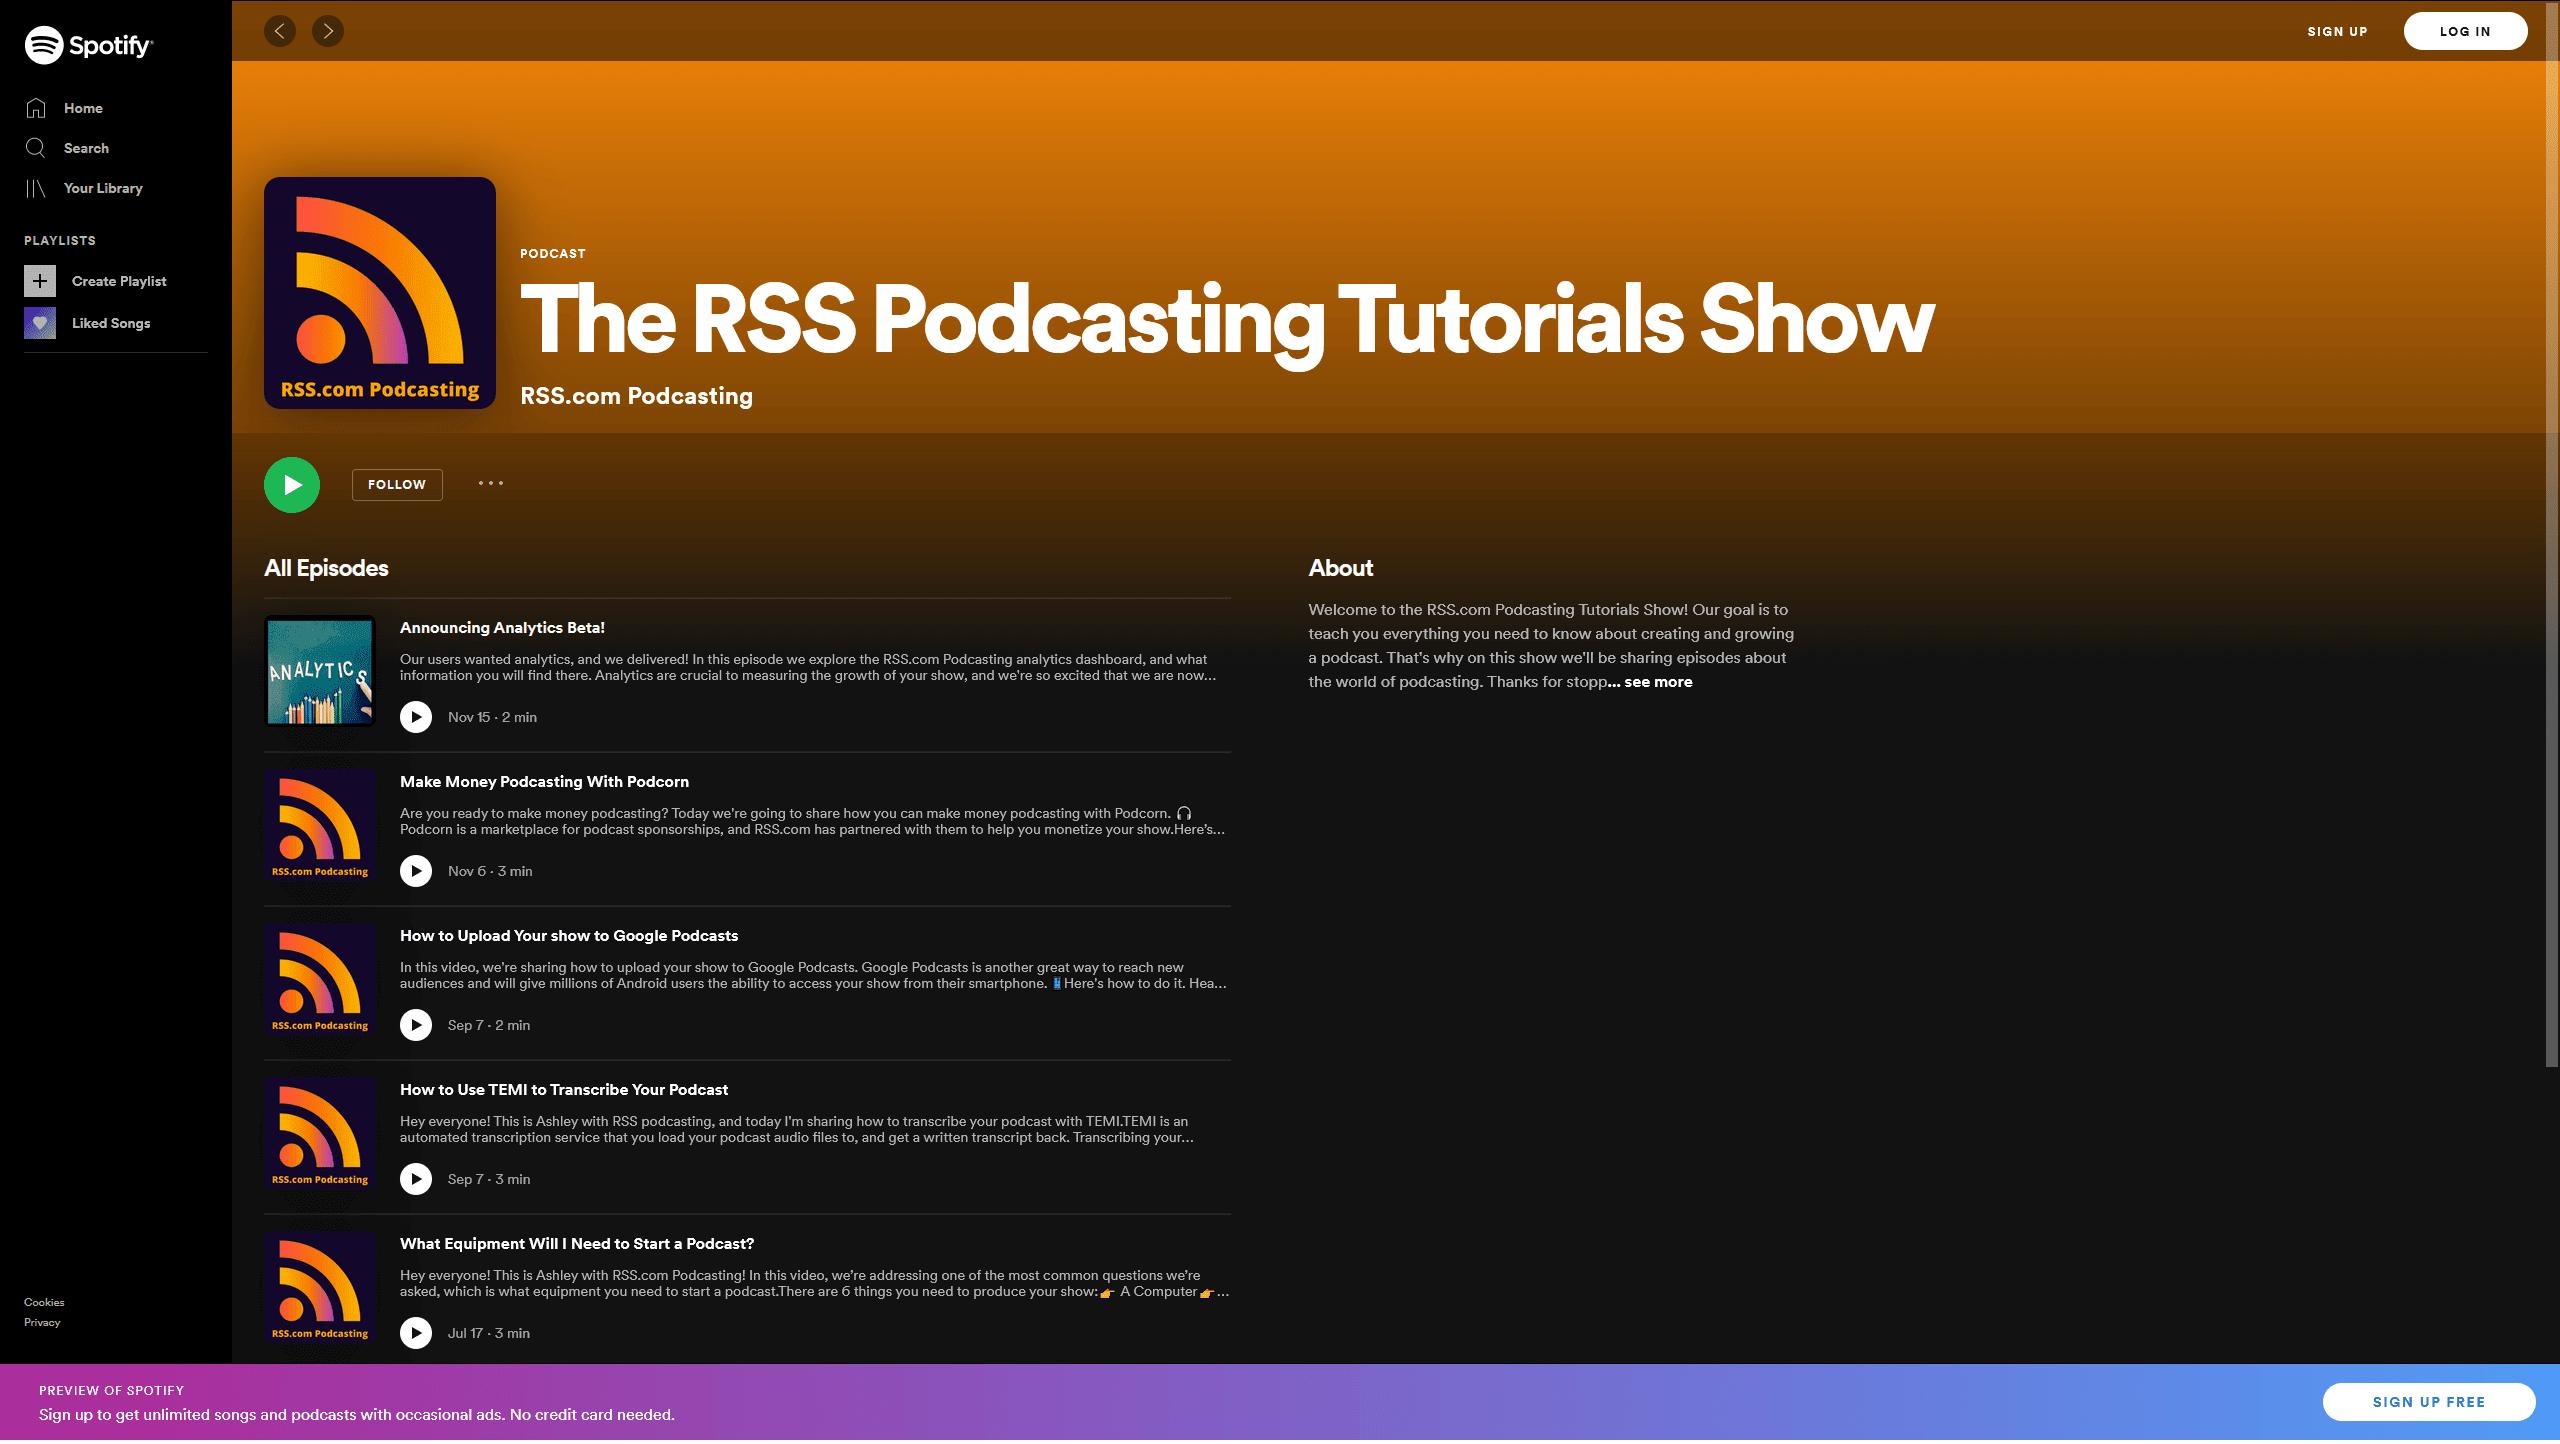 podcast episode art on spotify